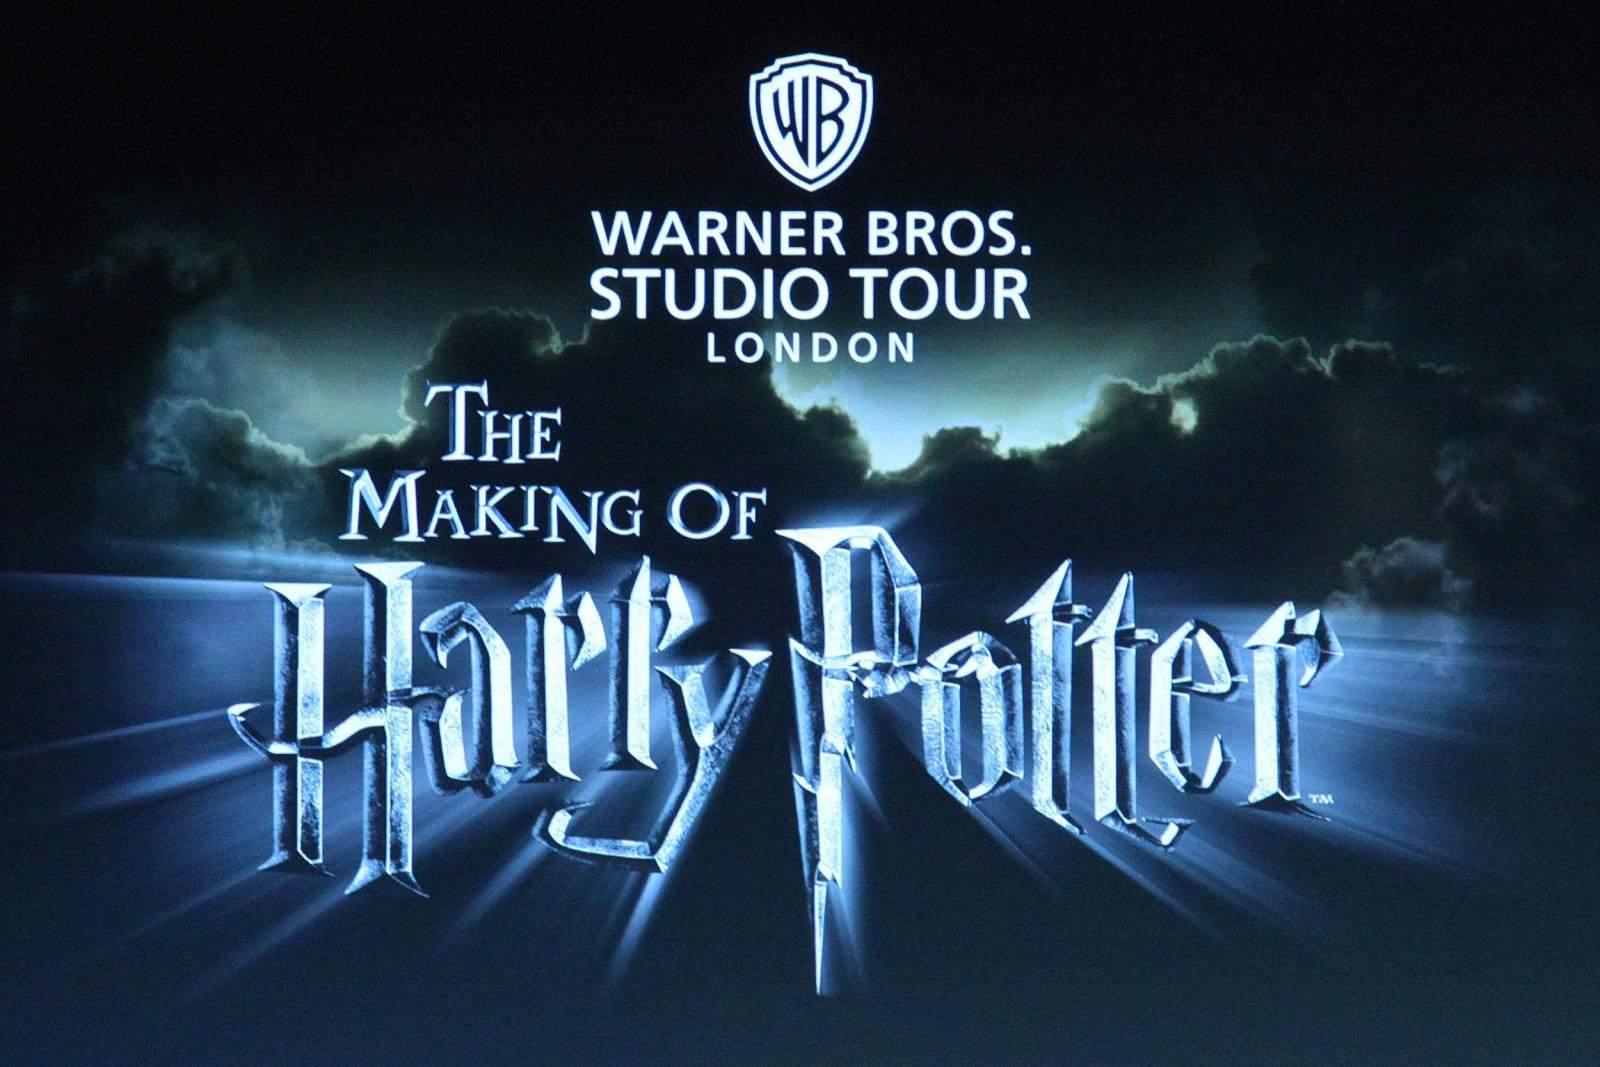 making harry potter18 The Making of Harry Potter, Warner Bros Studio London